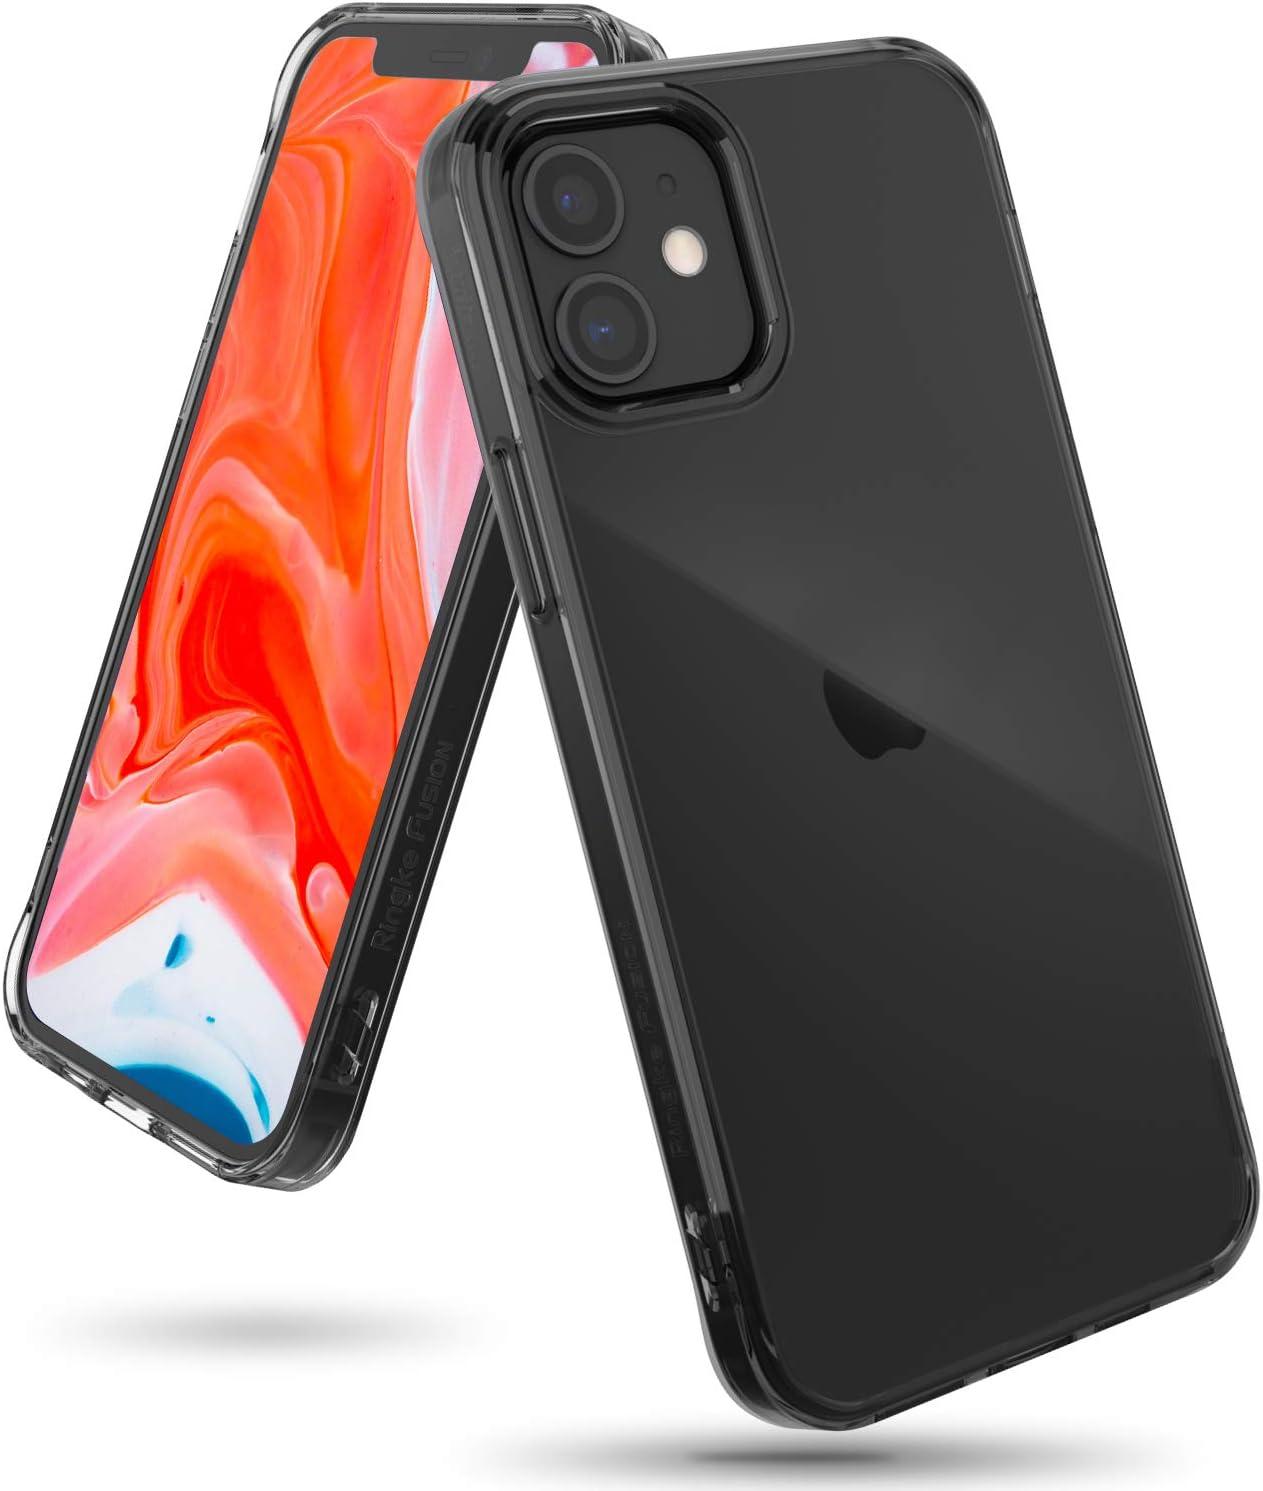 Ringke Fusion Handyhülle Kompatibel Mit Iphone 12 Elektronik